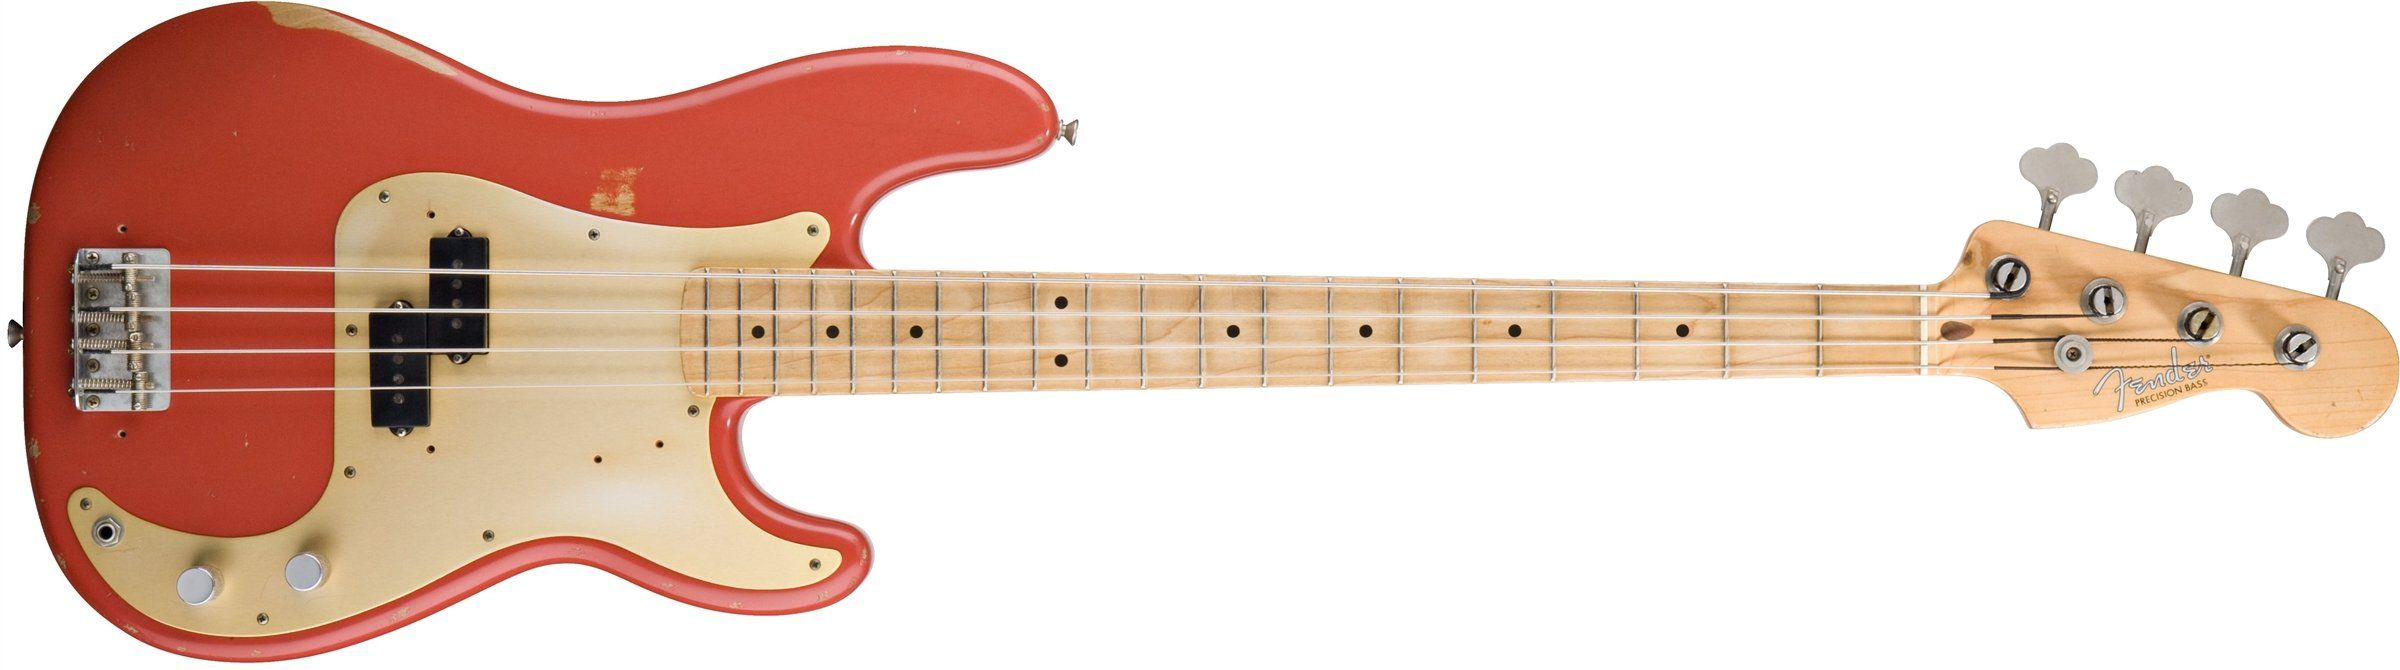 Fender Road Worn '50s Precision Electric Bass Guitar, Maple Fretboard, Gold Anodized Aluminum Pickguard - Fiesta Red